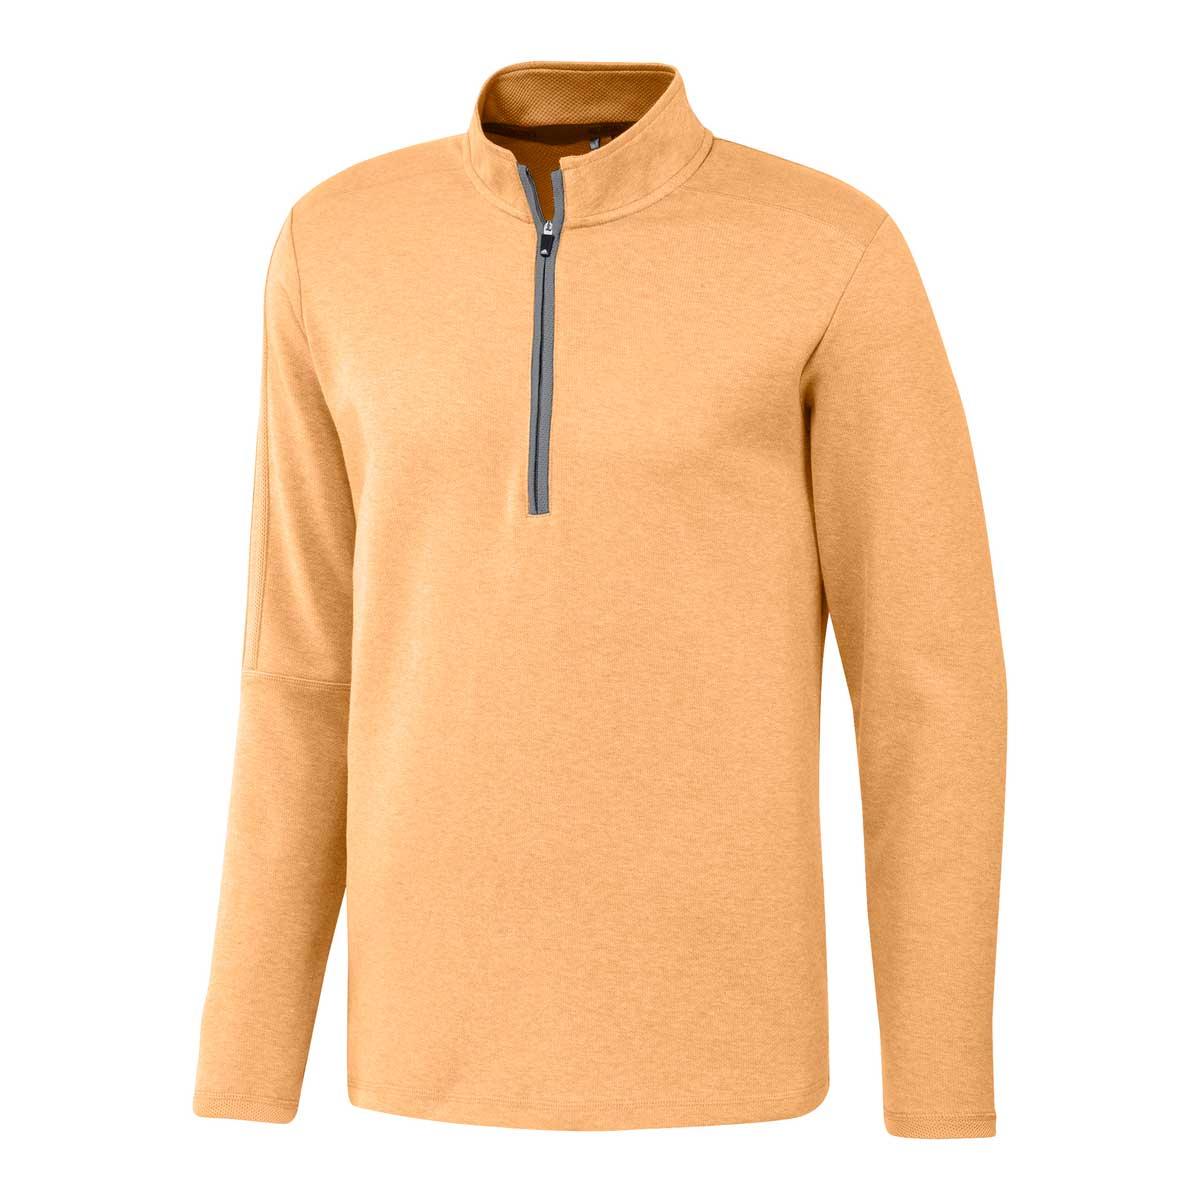 Adidas Men's 3-Stripe 1/4 Zip Acid Orange Layering Pullover